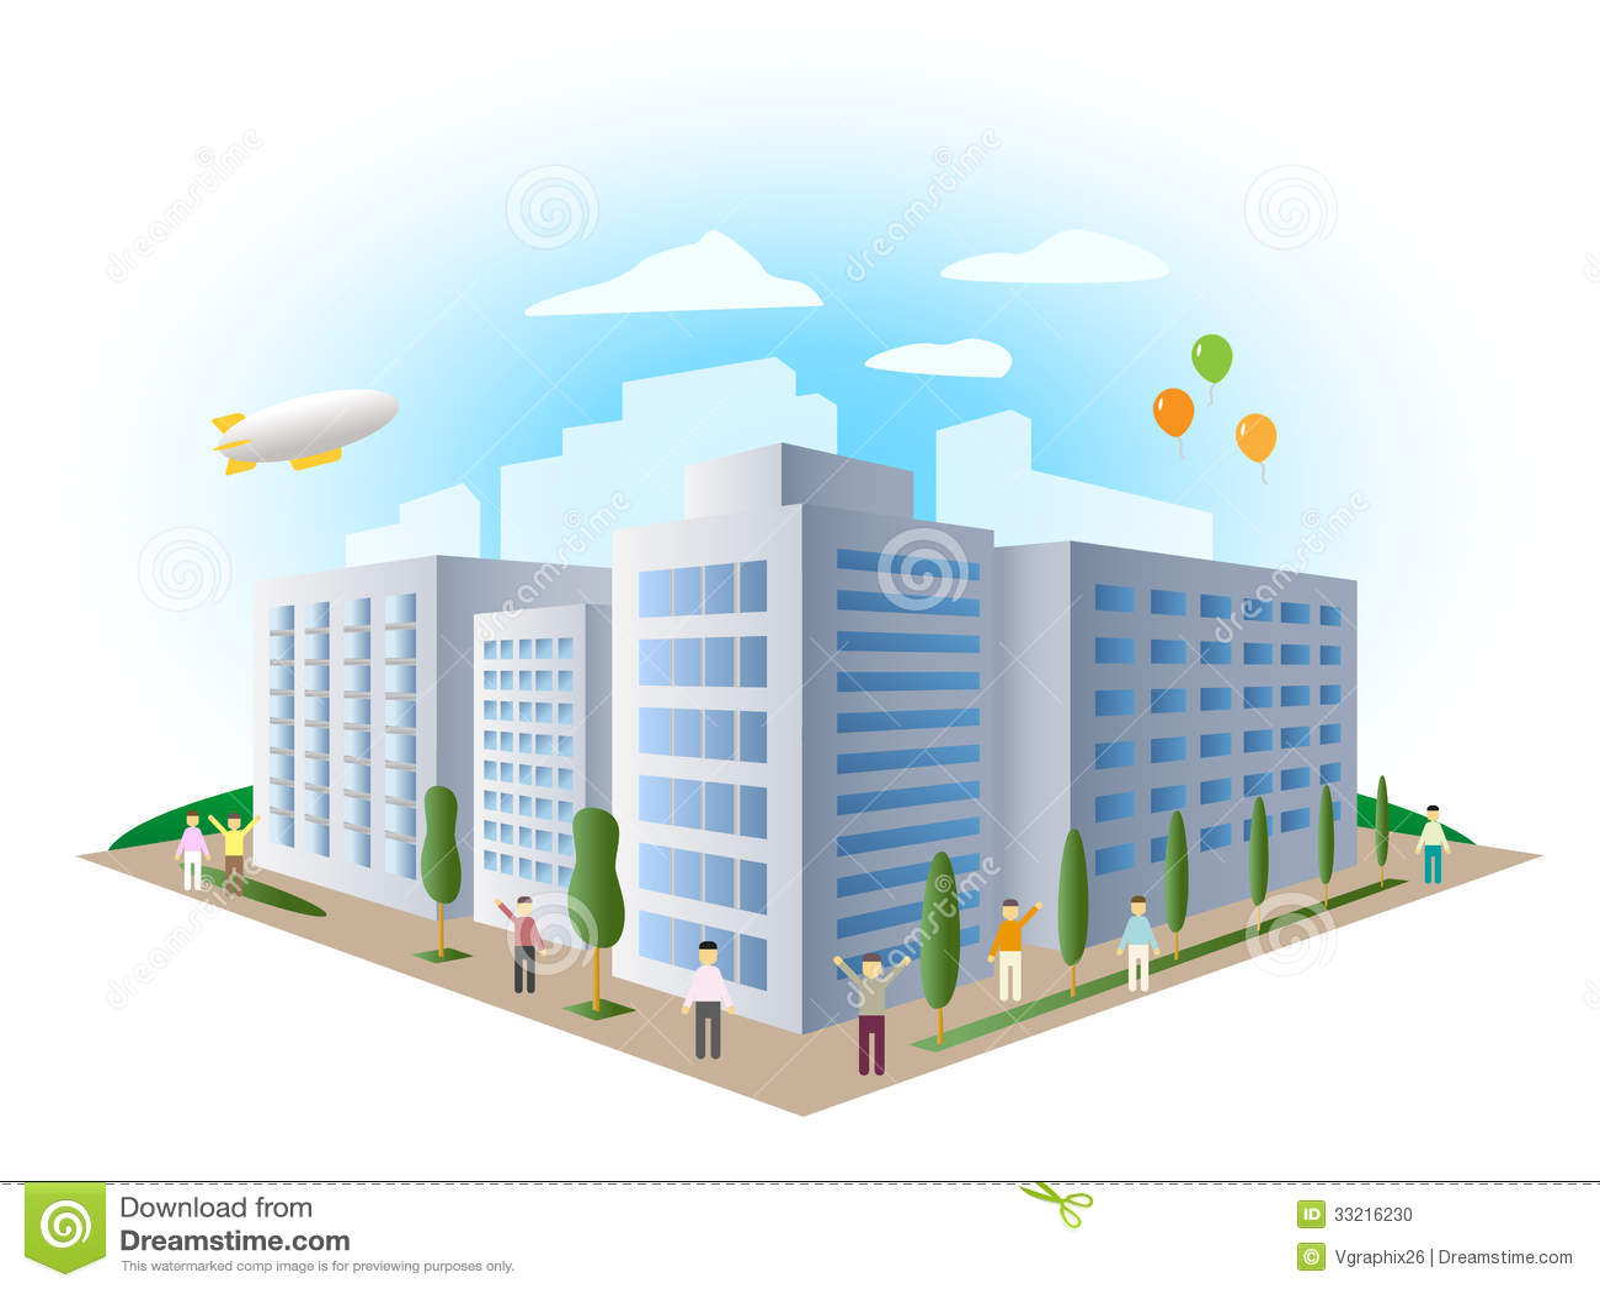 Town Landscape Vector Illustration: Urban Landscape Building, Vector Stock Photo